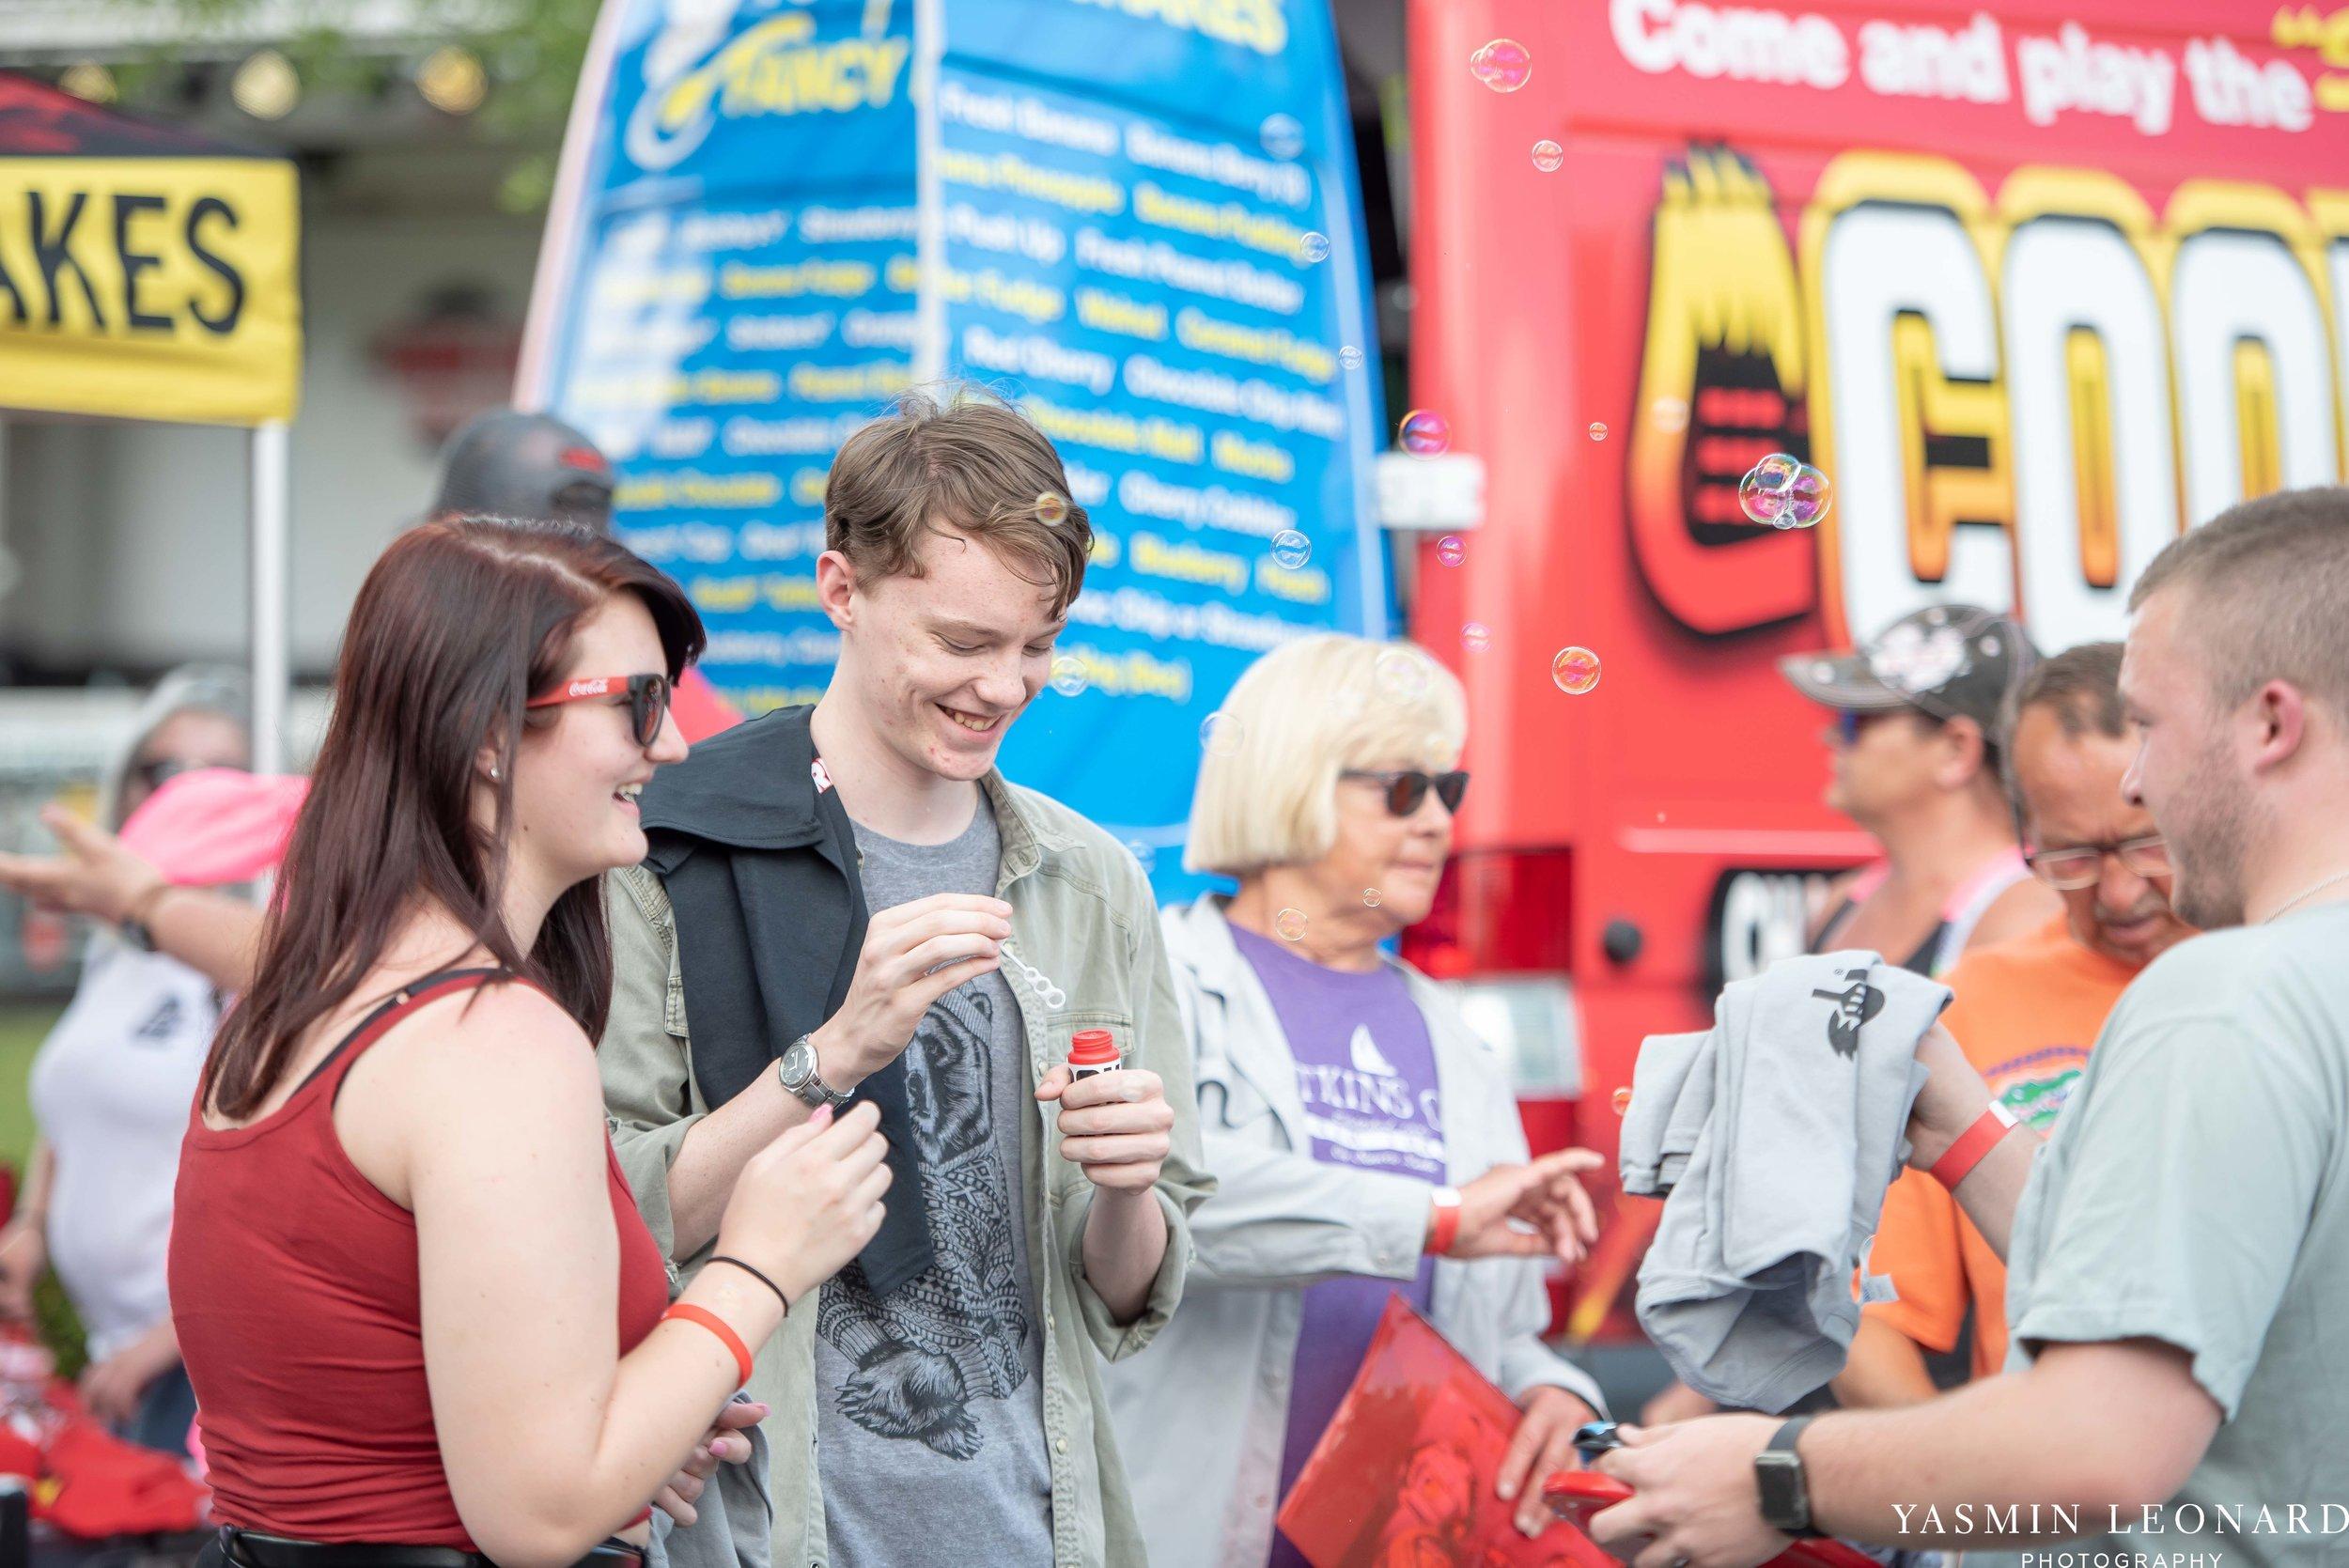 Cookout - CocaCola 600 - Coca Cola - Austin Dillon - Nascar - Nascar Meet and Greet - Yasmin Leonard Photography-5.jpg